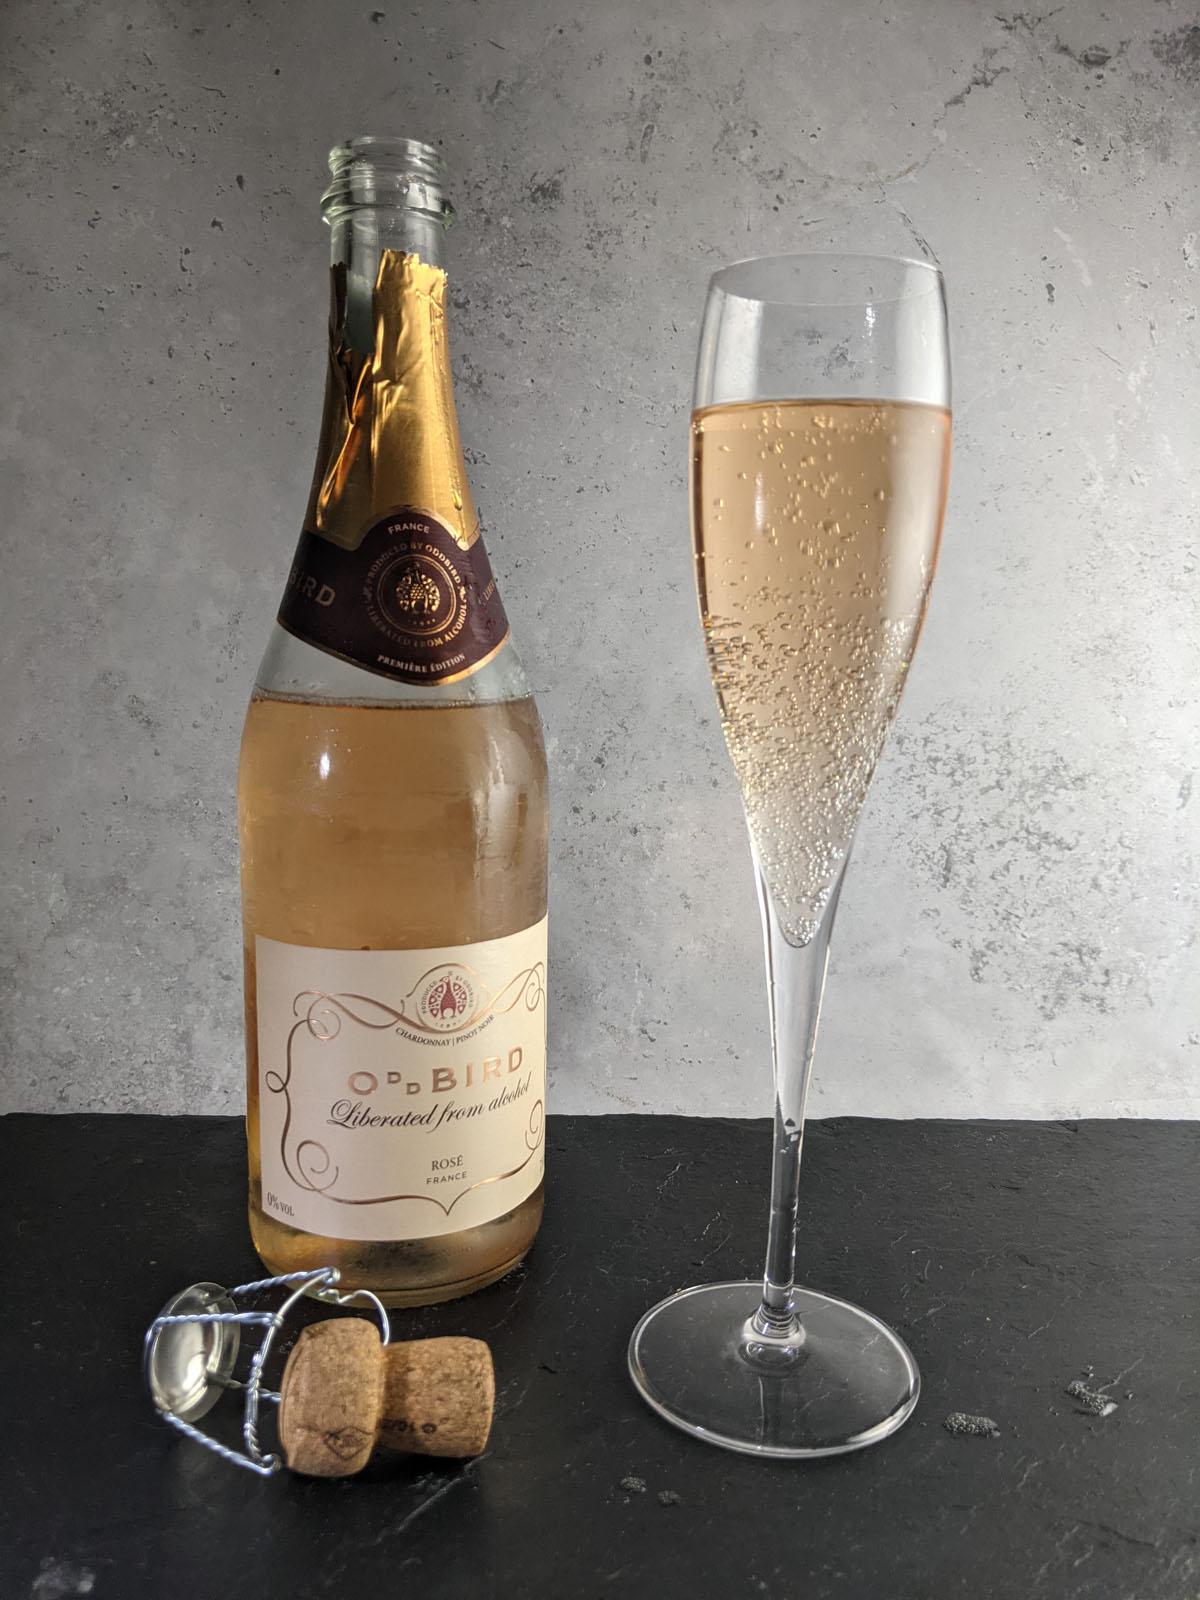 Rose Sparkling Wine from Oddbird